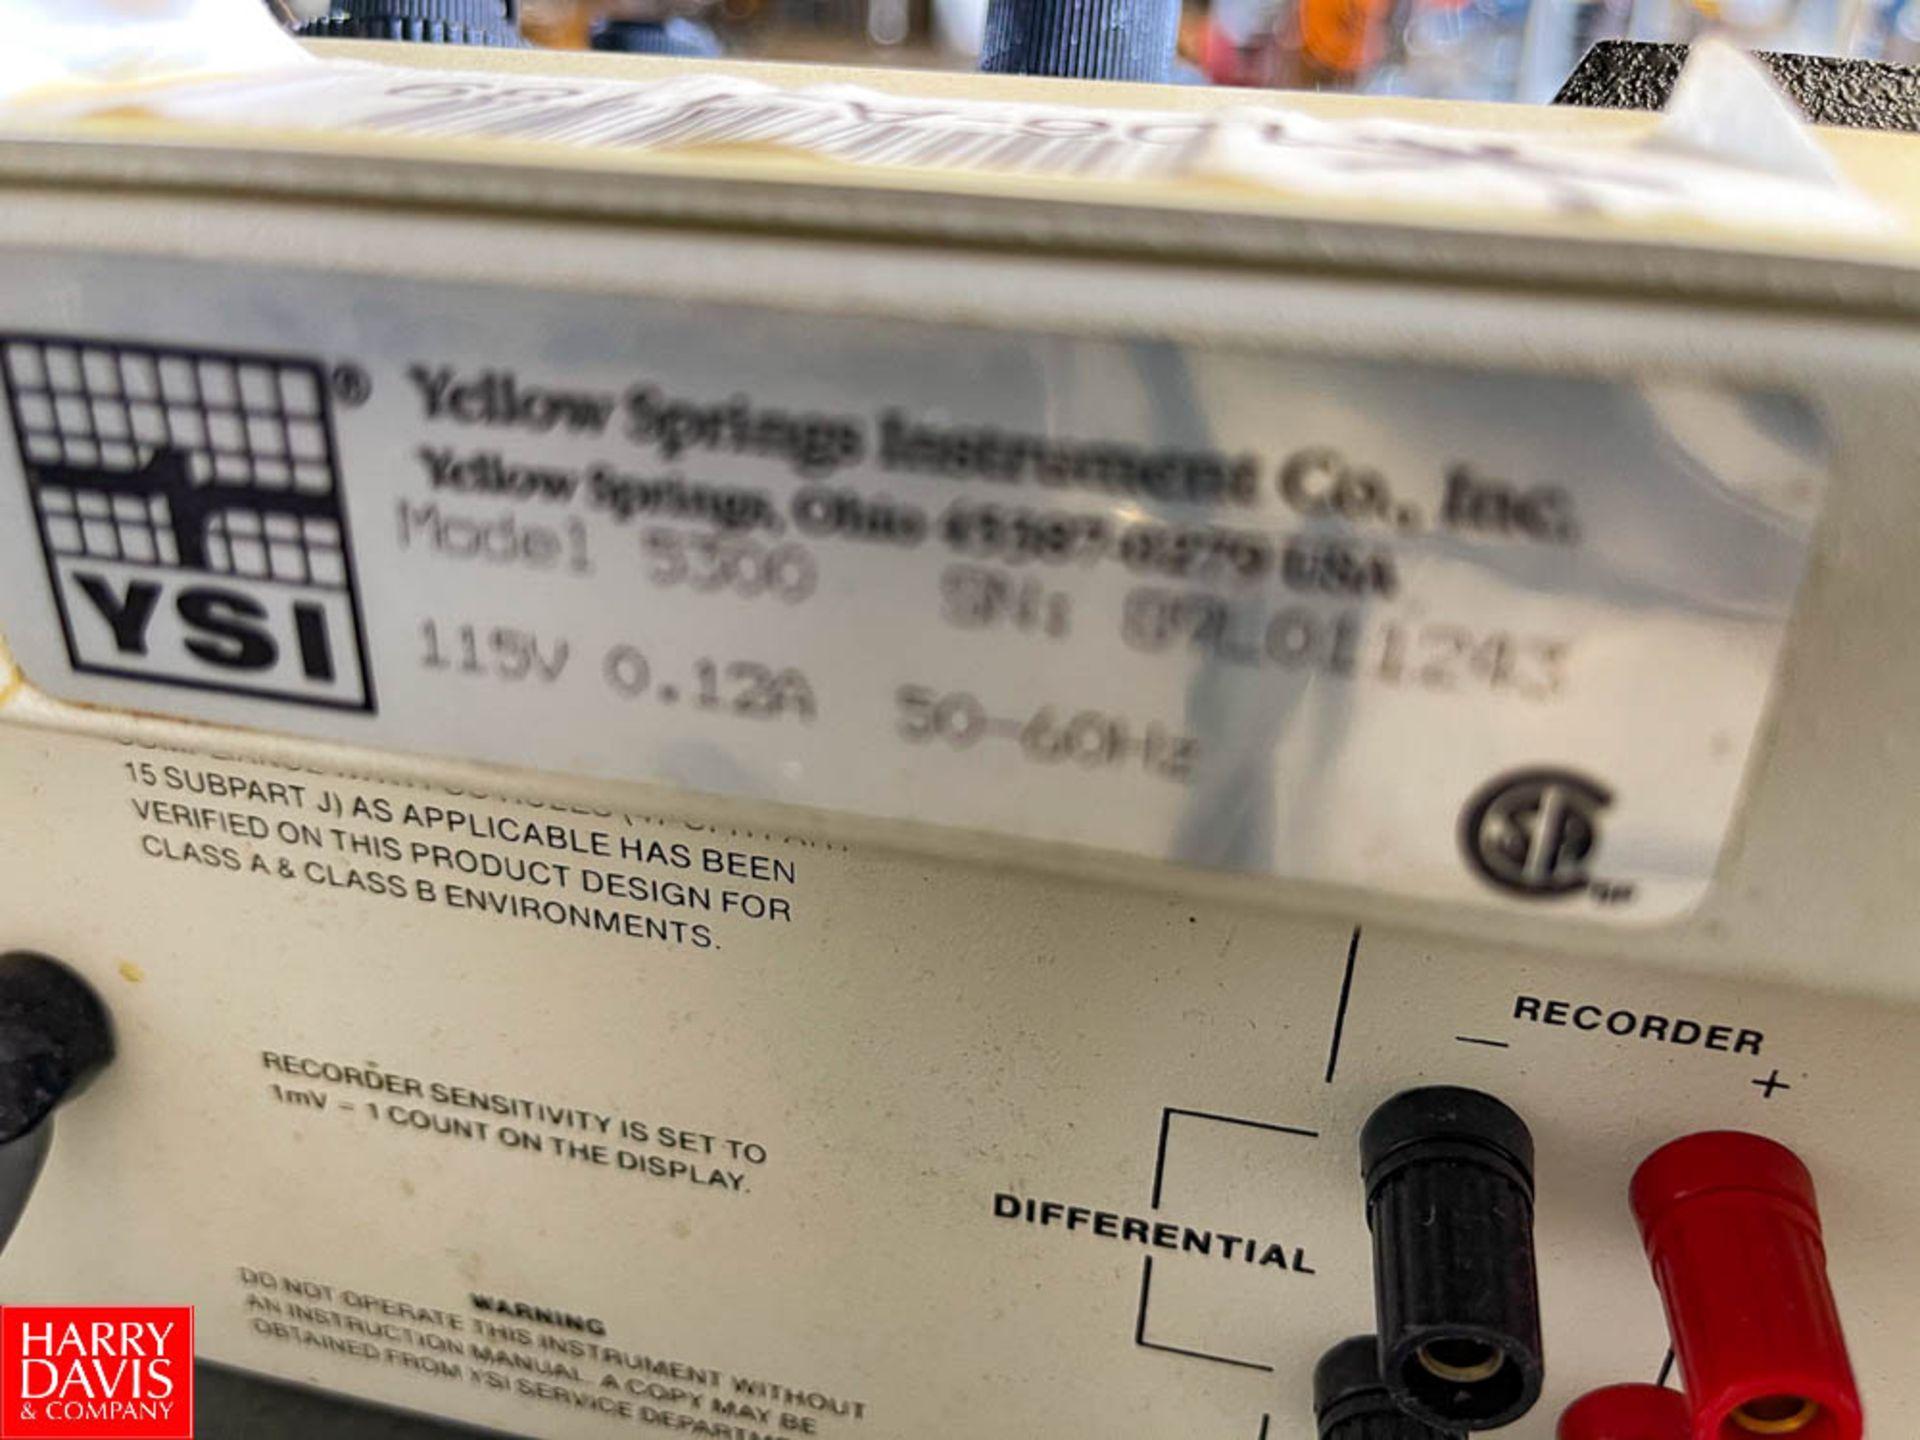 YSI Biological Oxygen Monitor Model 5300 - Image 2 of 2